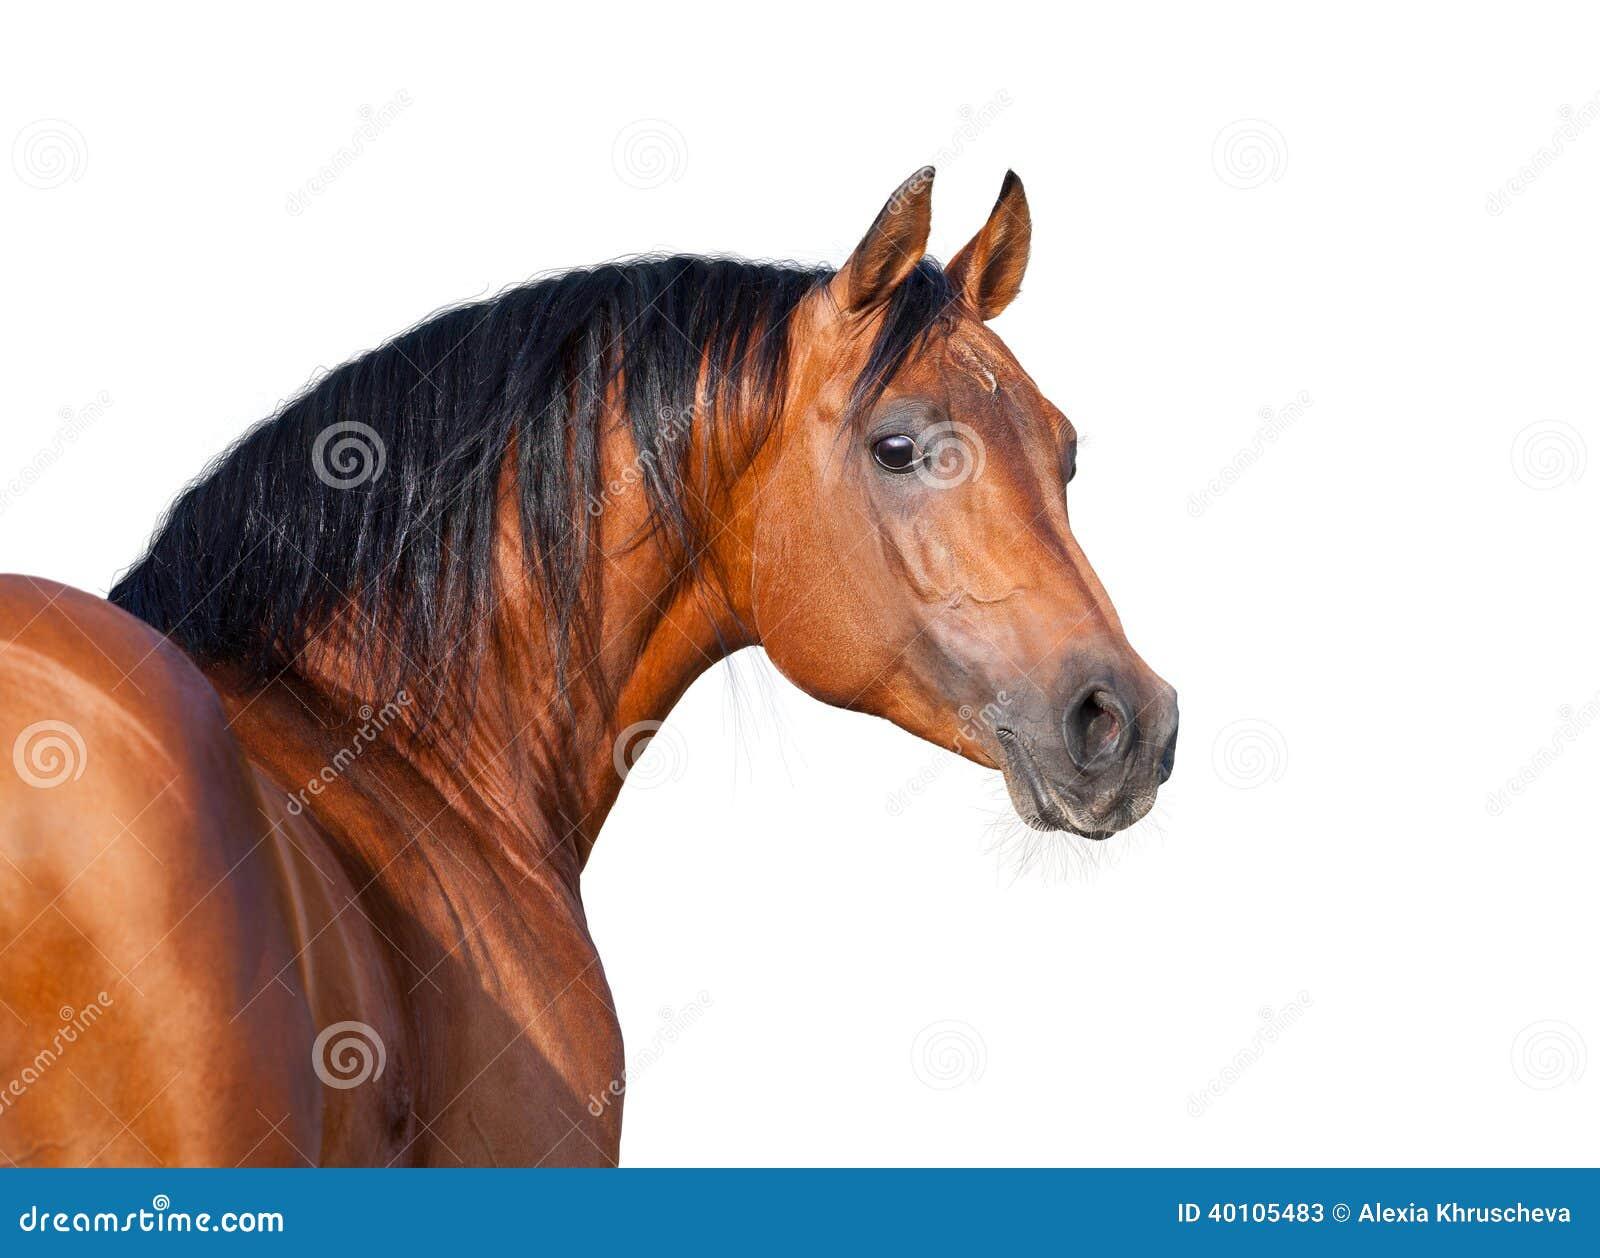 Chestnut horse head isolated on white background.